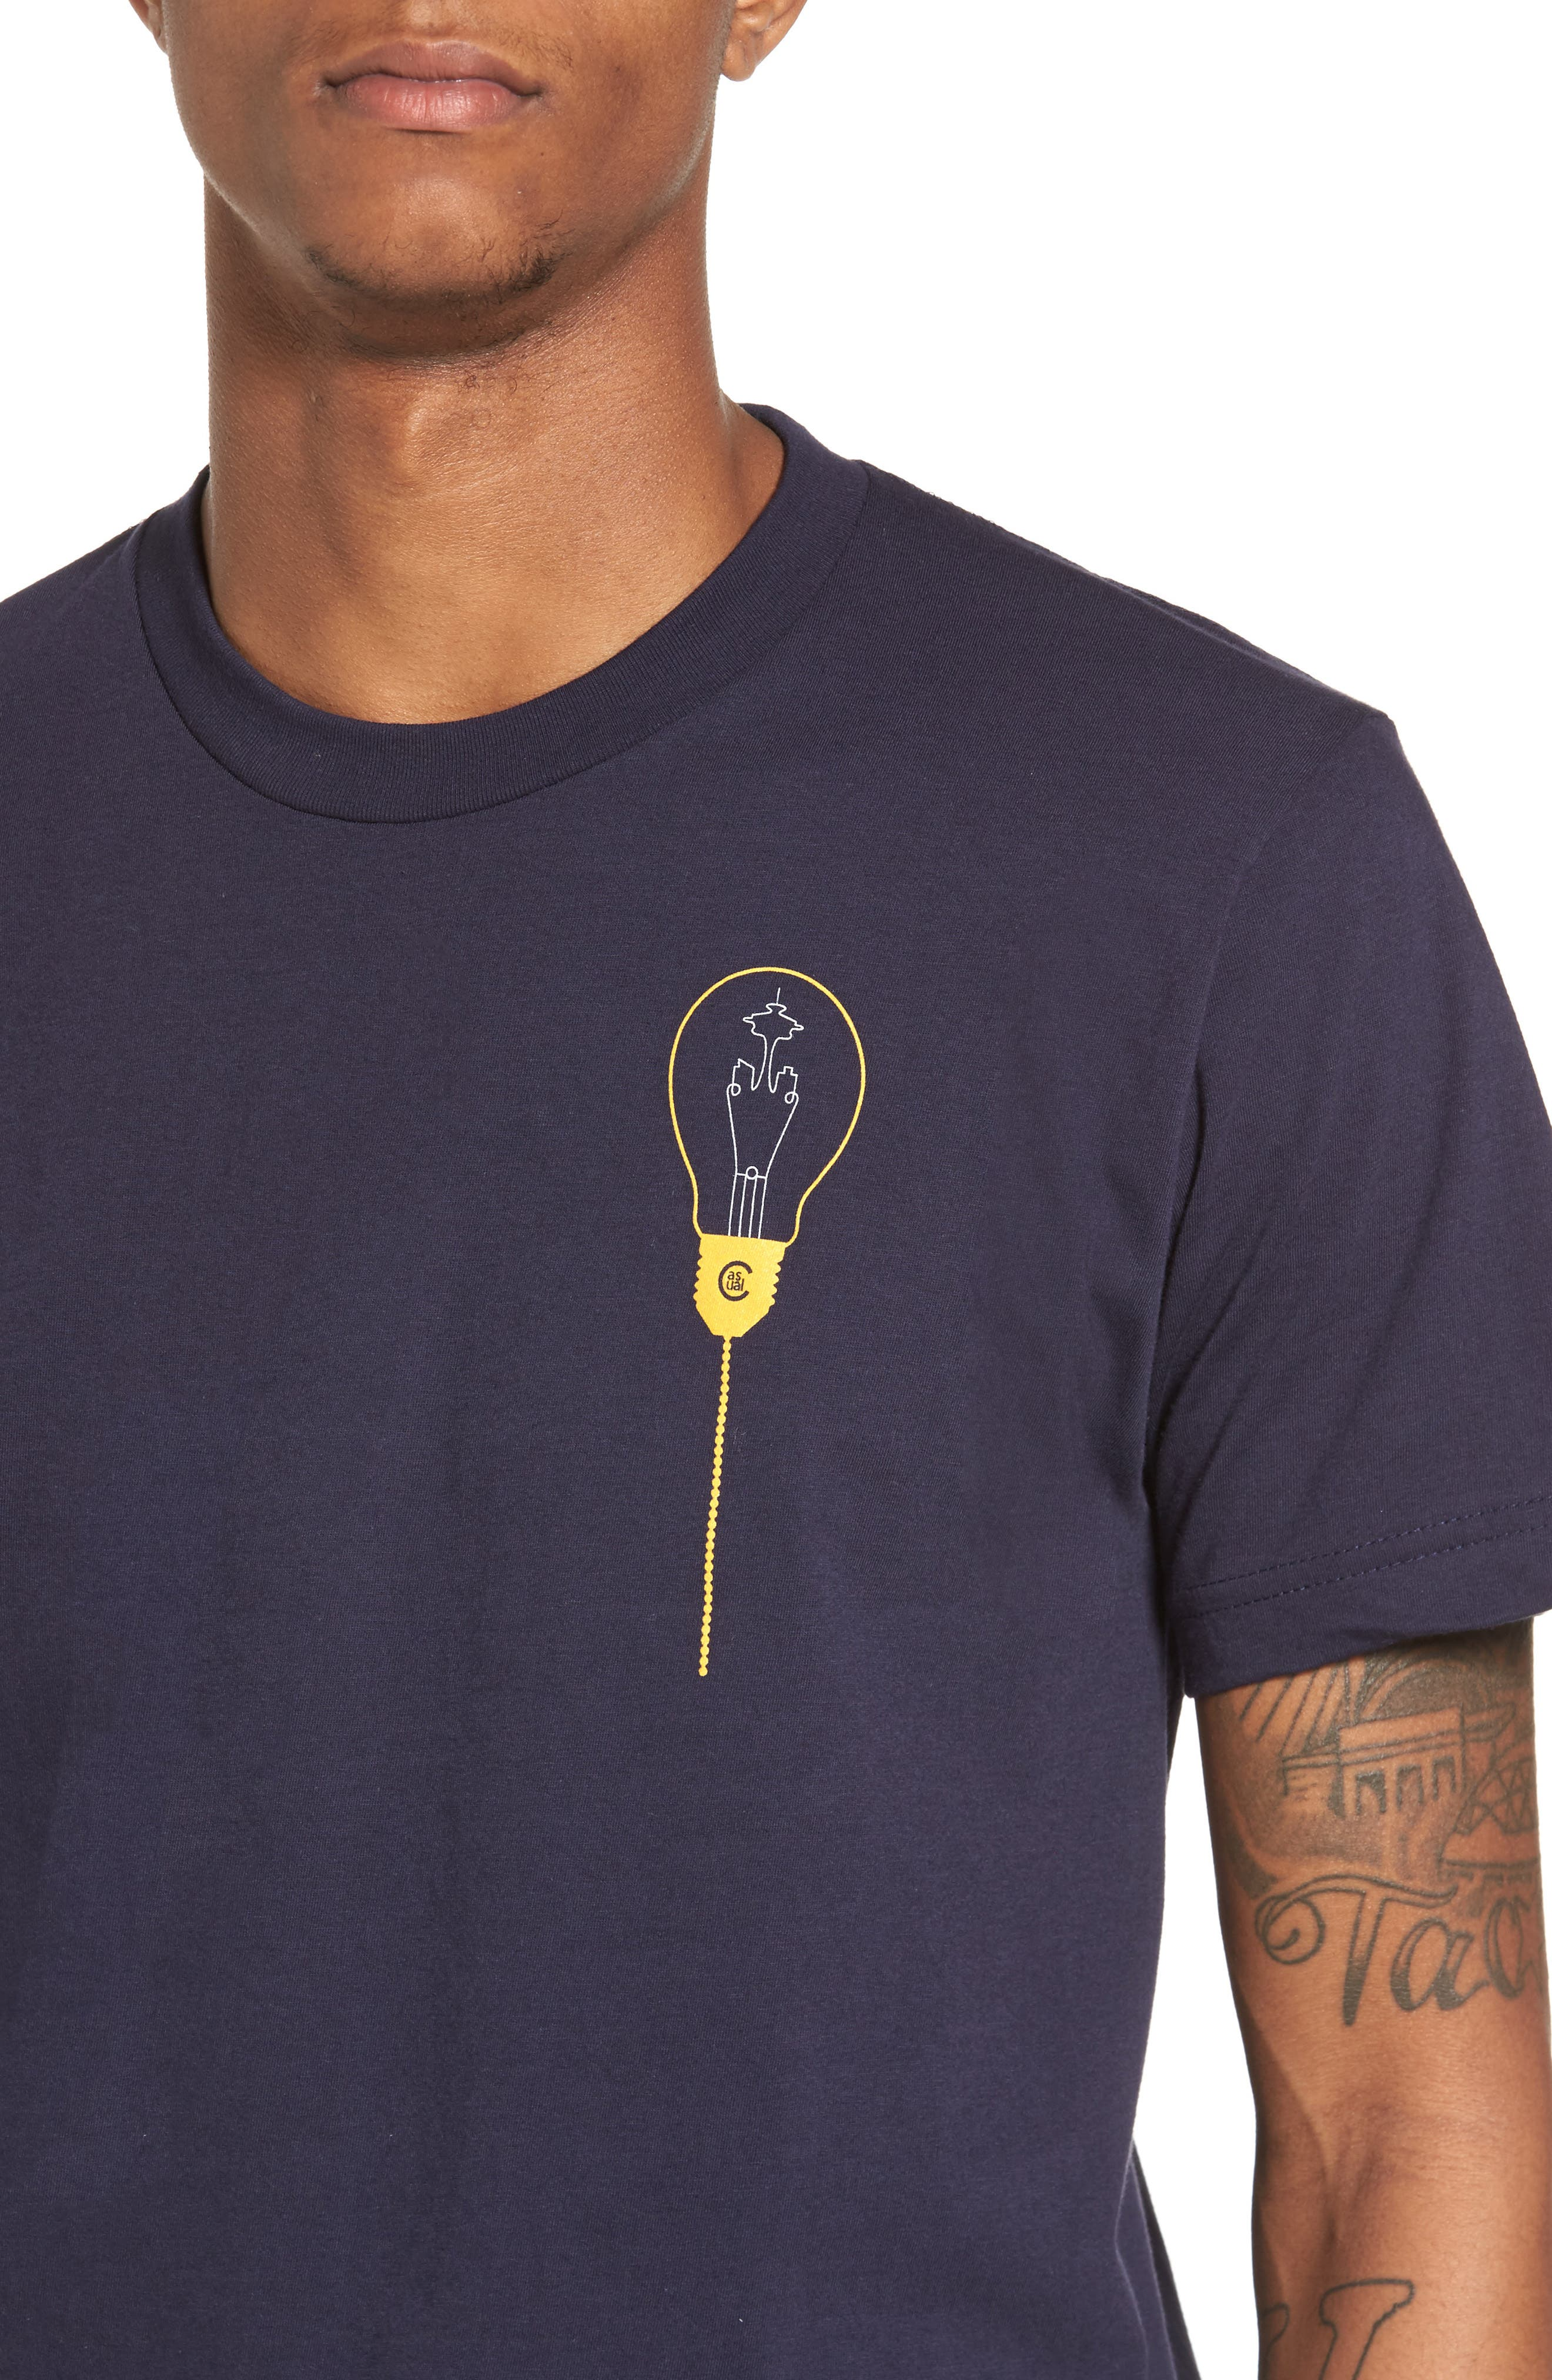 Keeping Seatown Lit T-Shirt,                             Alternate thumbnail 4, color,                             400